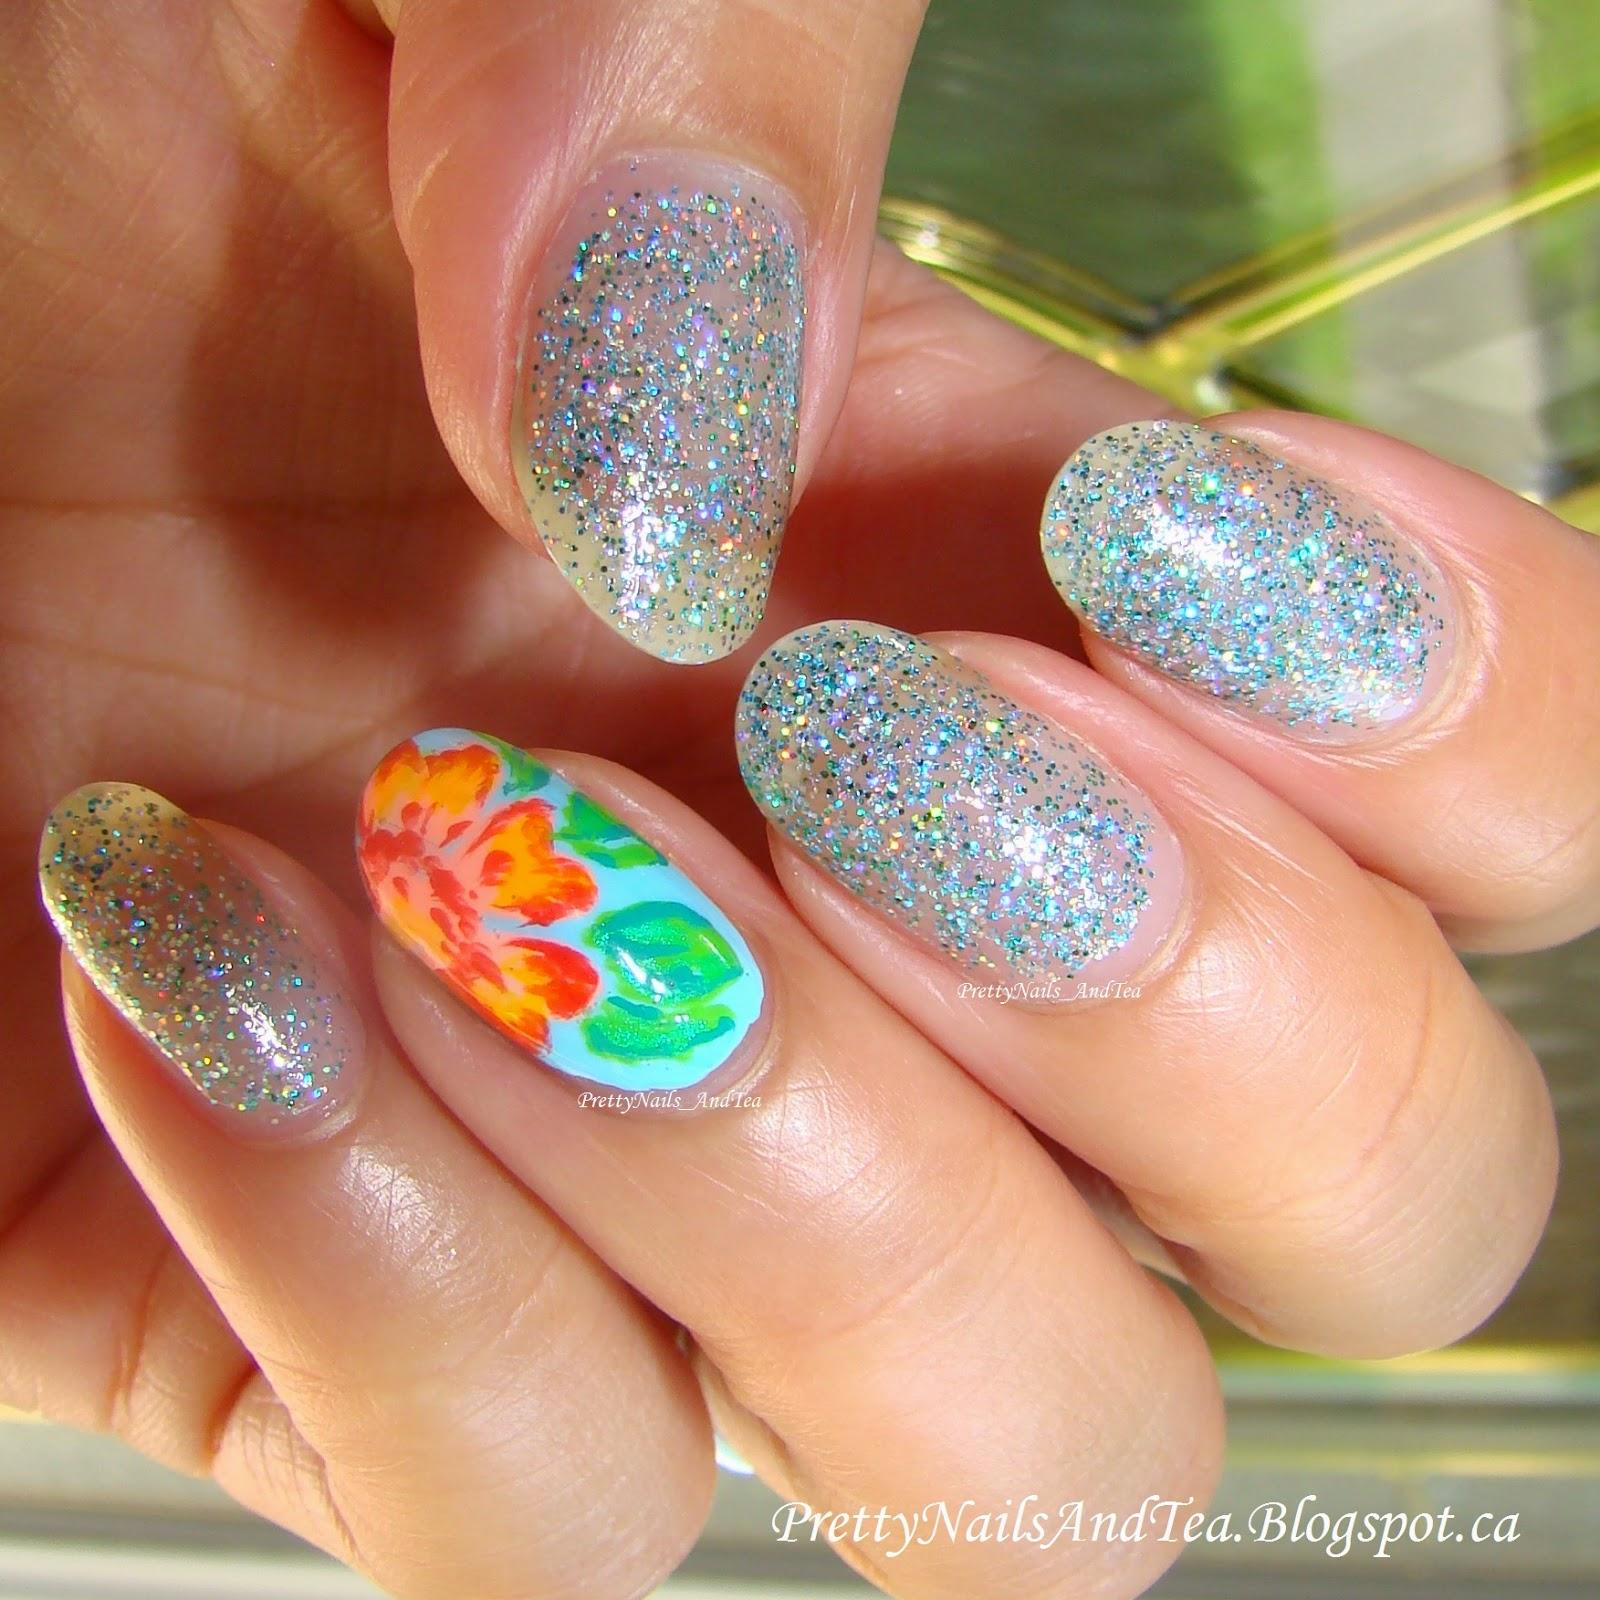 glitter | Prettynailsandtea.blogspot.ca